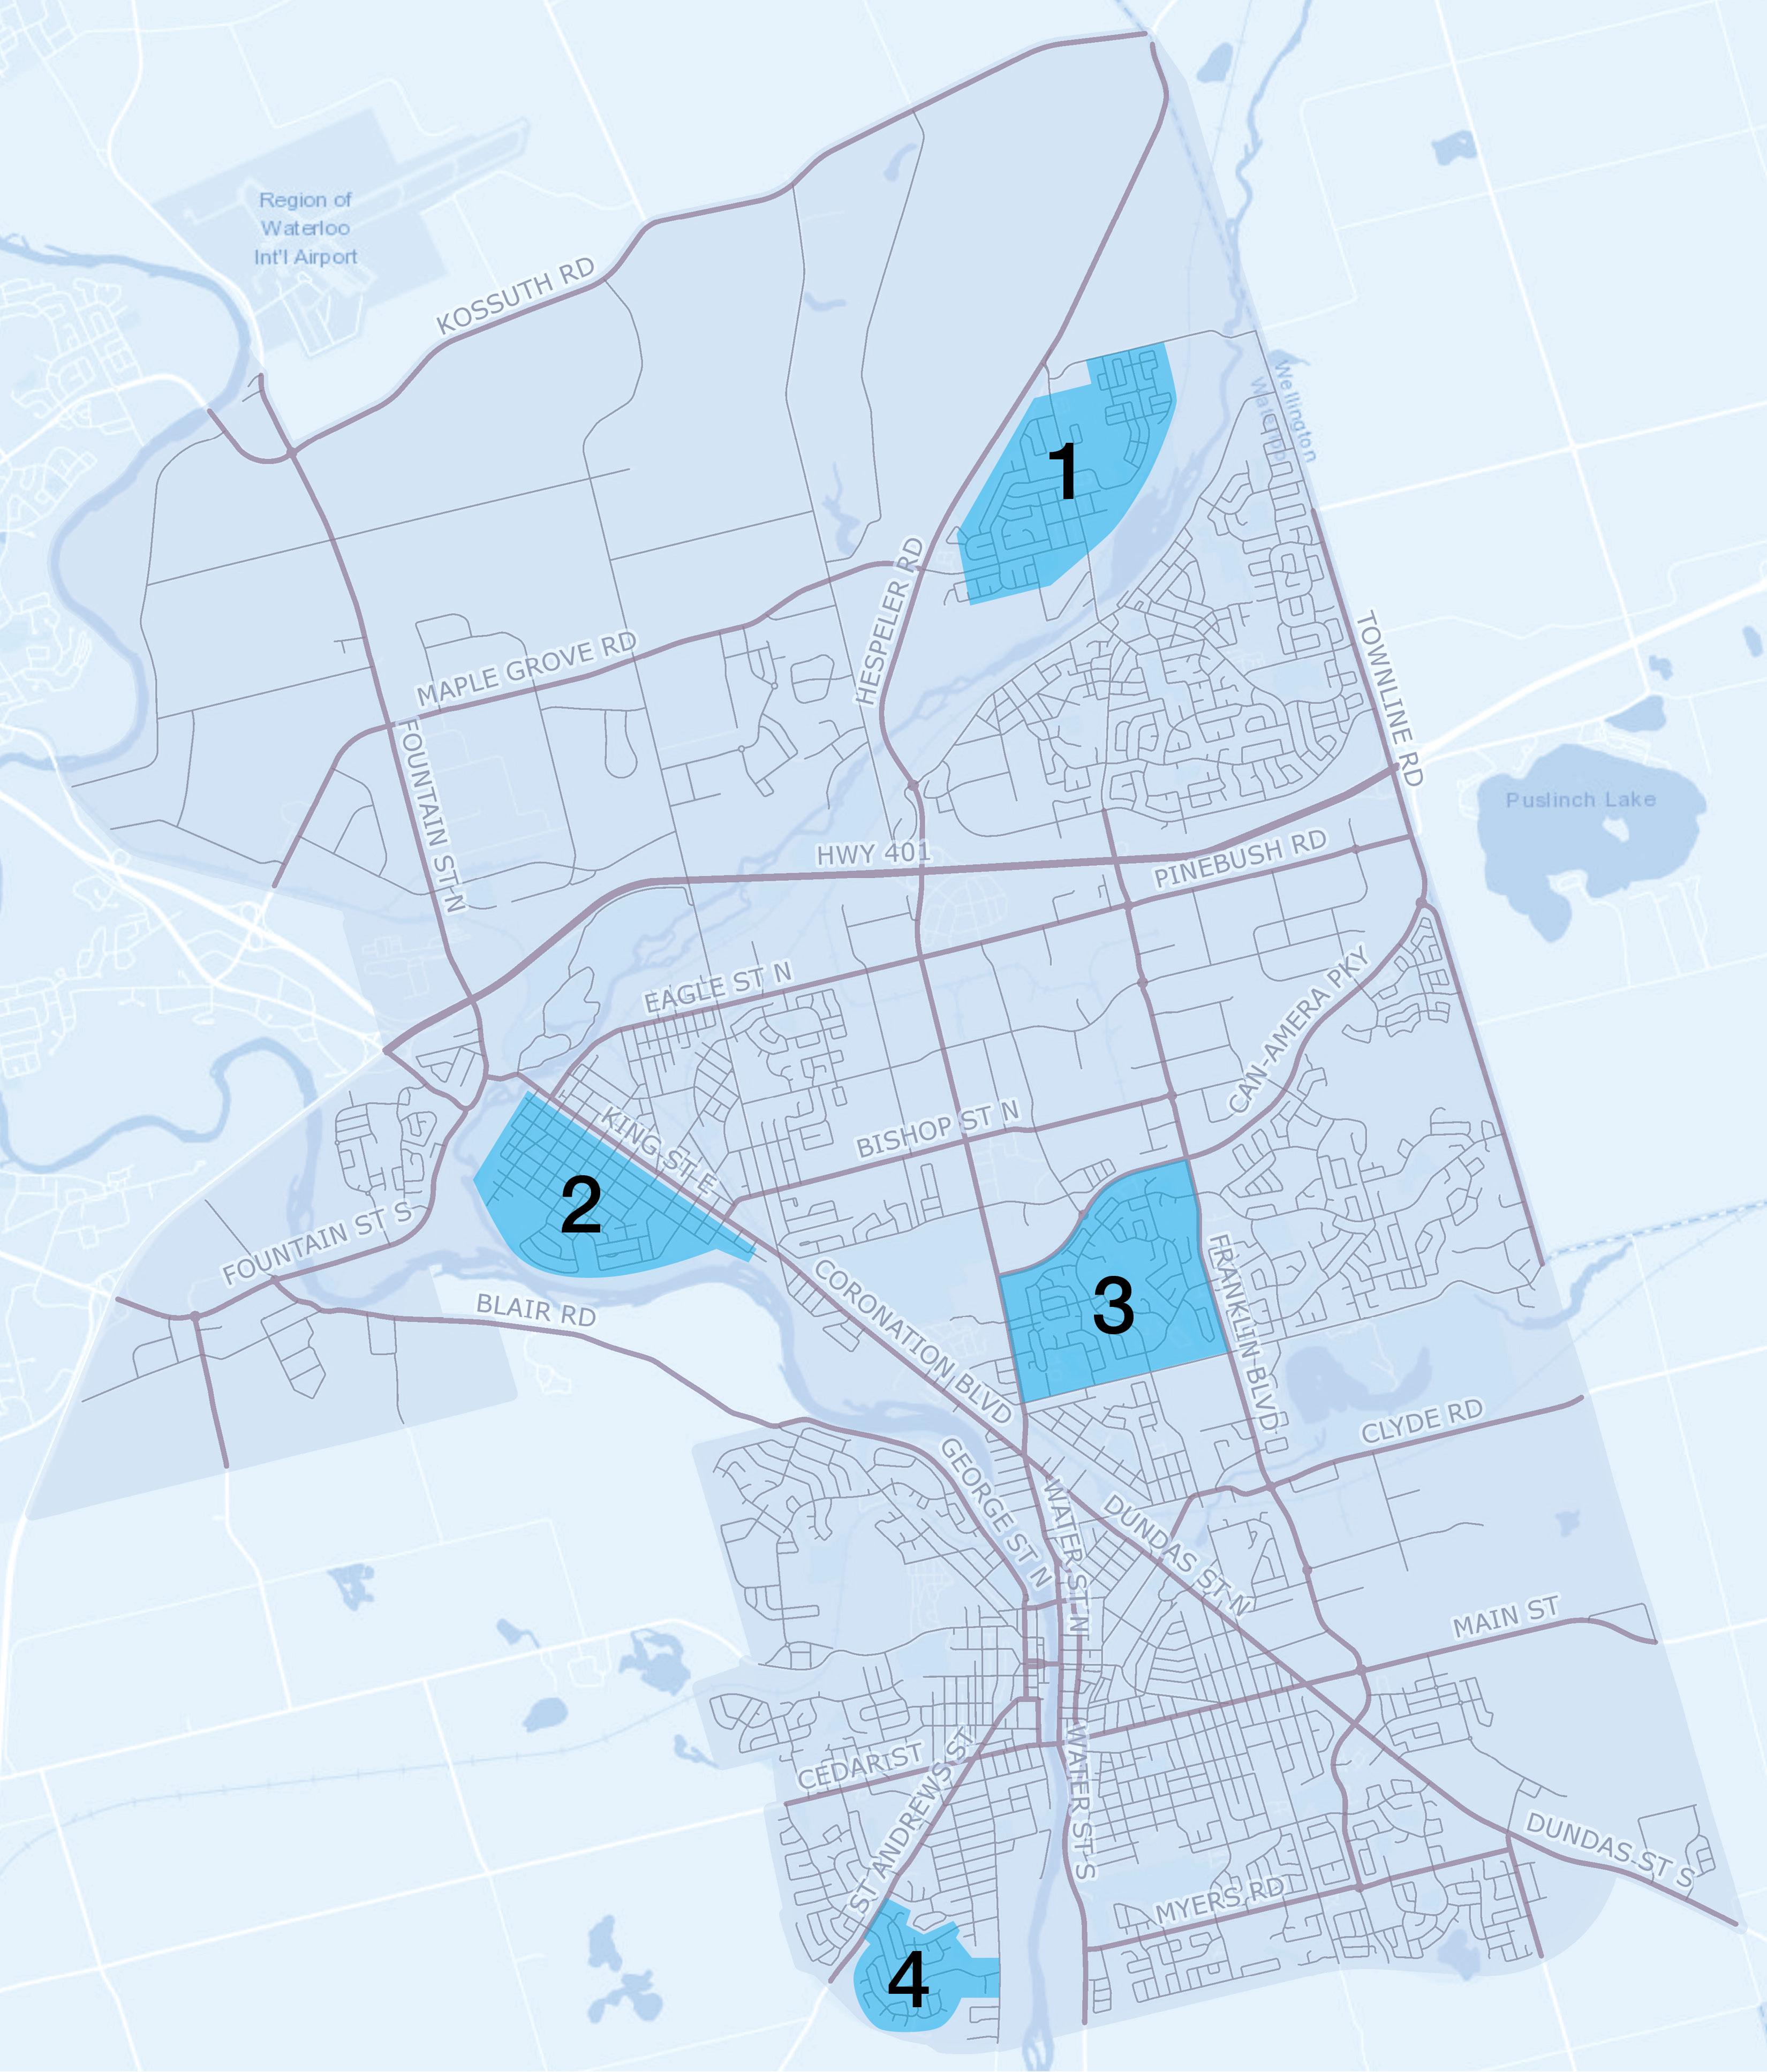 map of cambridge highlighting pilot areas